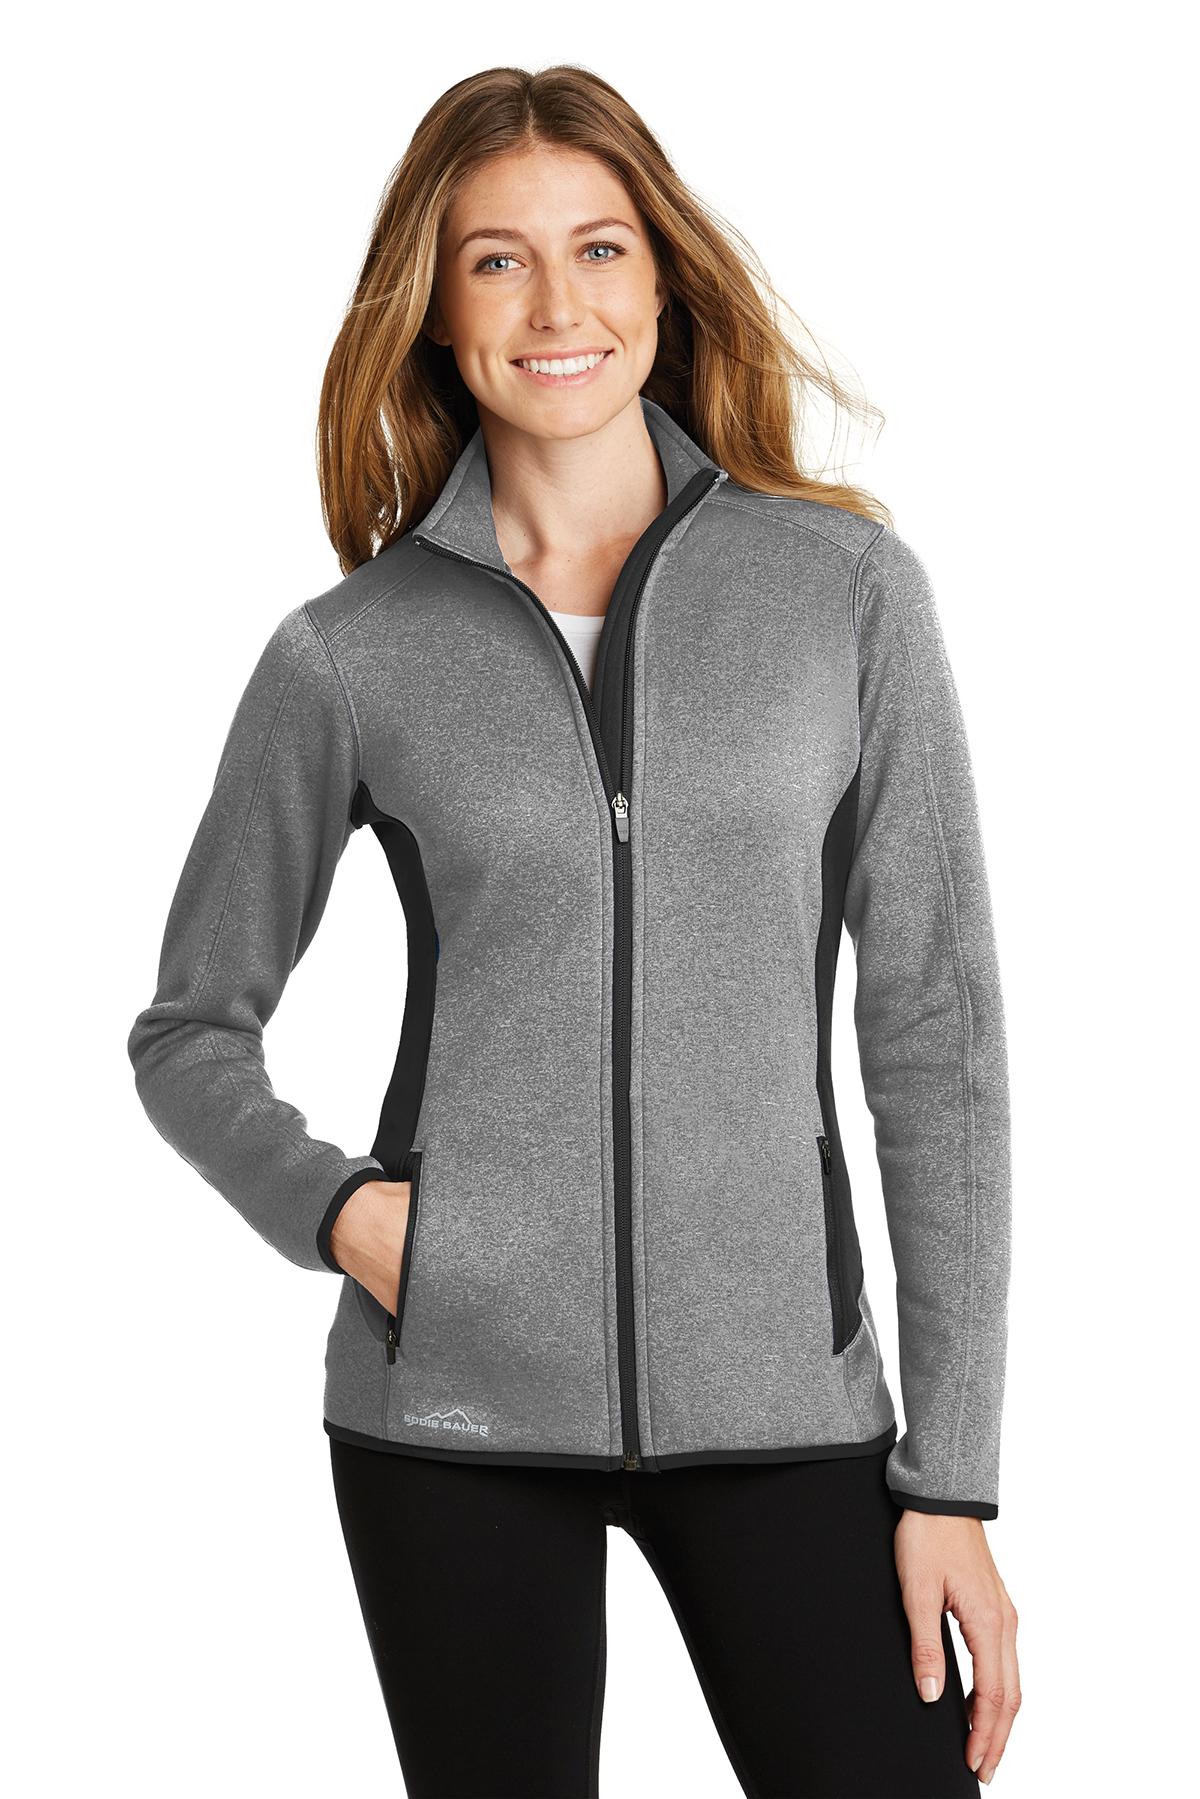 f7a6f53a03b6 Eddie Bauer® Ladies Full-Zip Heather Stretch Fleece Jacket | Ladies ...